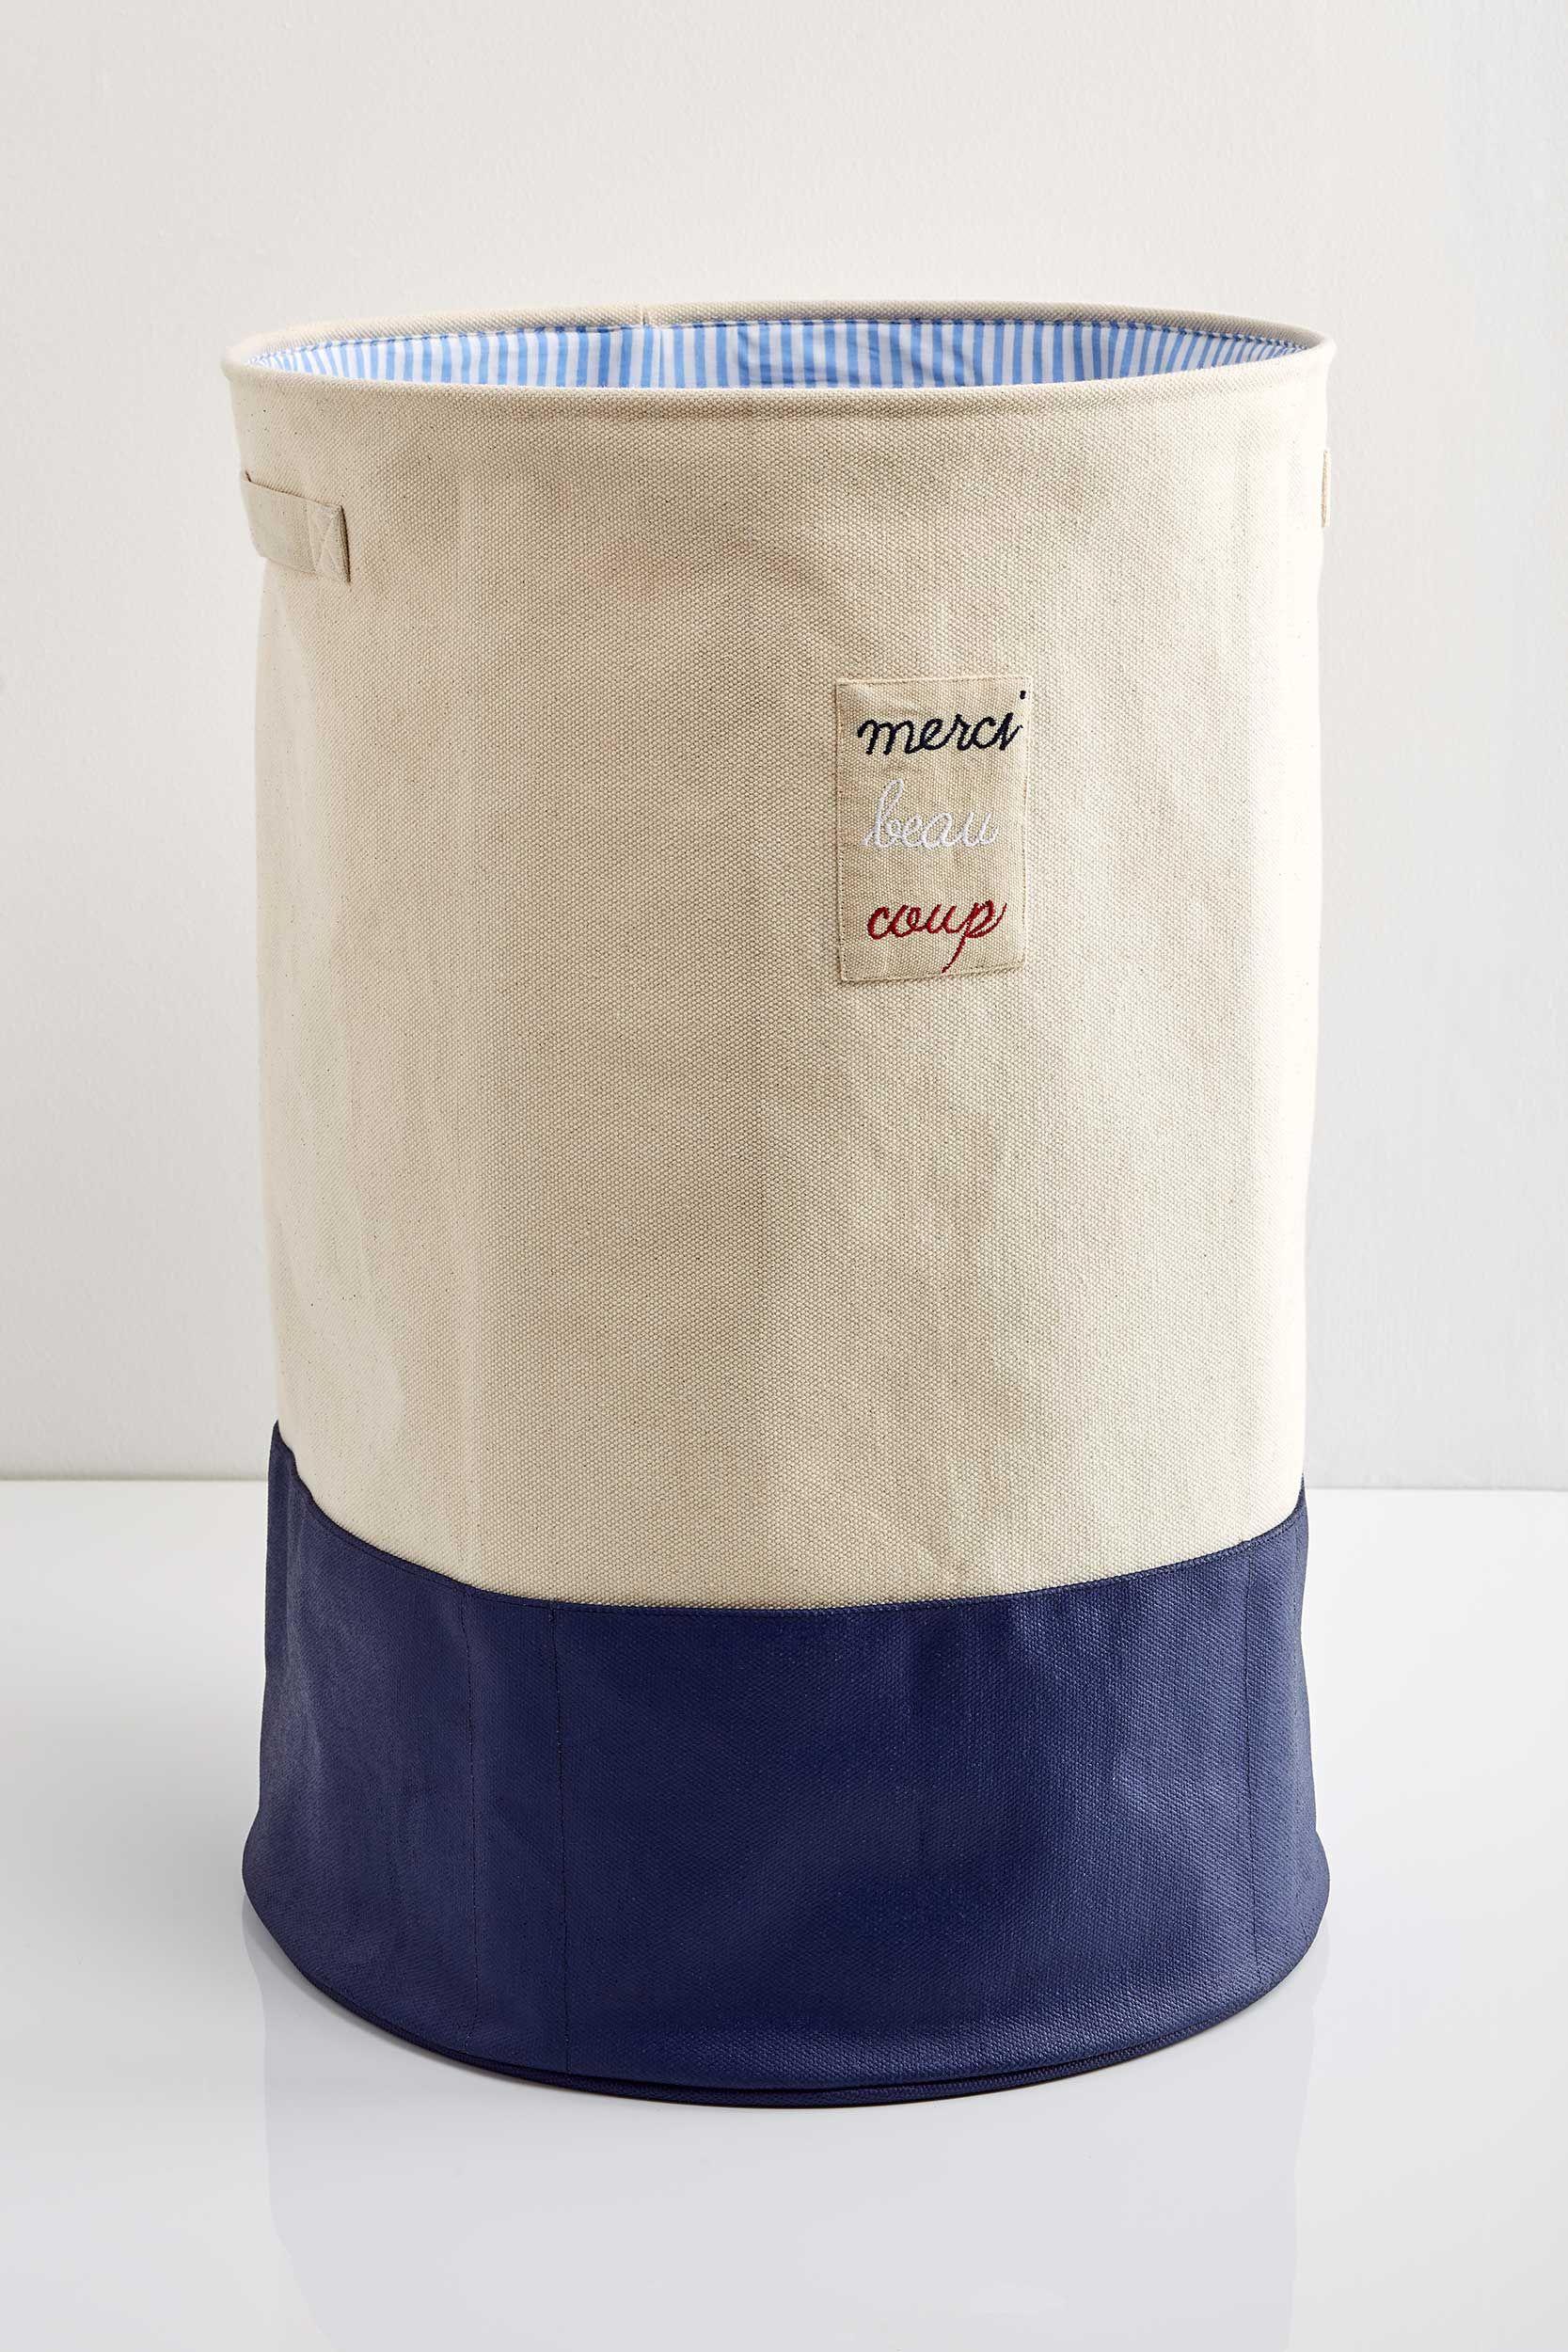 French Laundry Hamper In 2019 Laundry Hamper Storage Bins Laundry